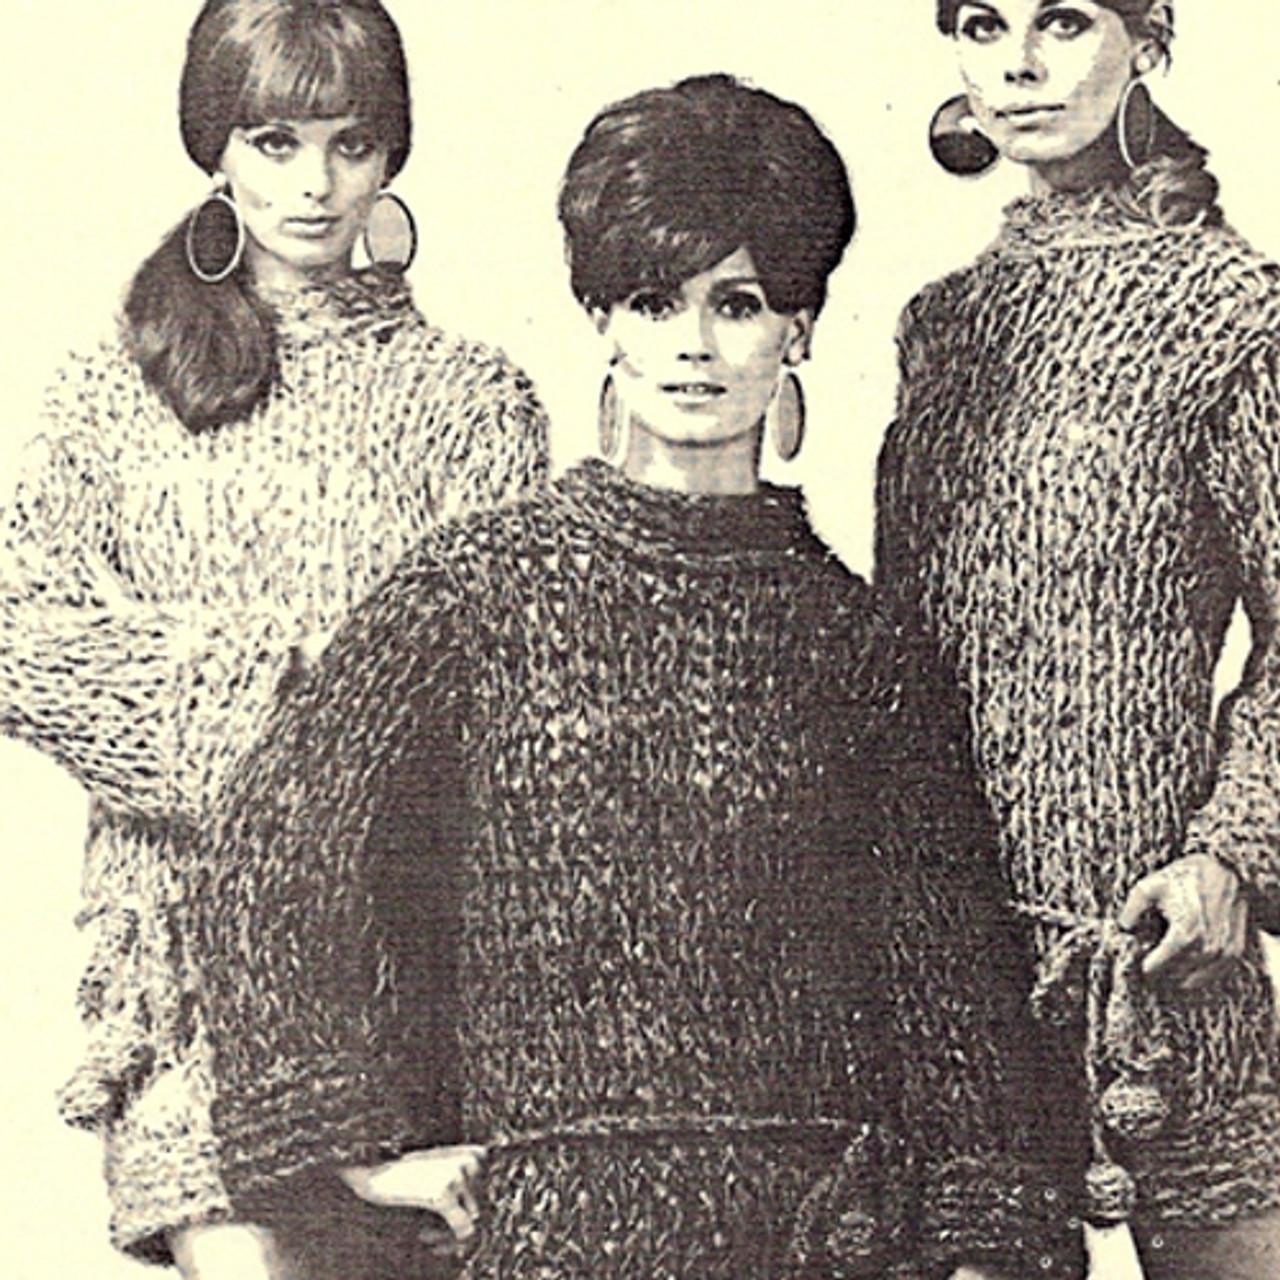 Jumbo Jets Knitted Mini Dress pattern, vintage 1960s